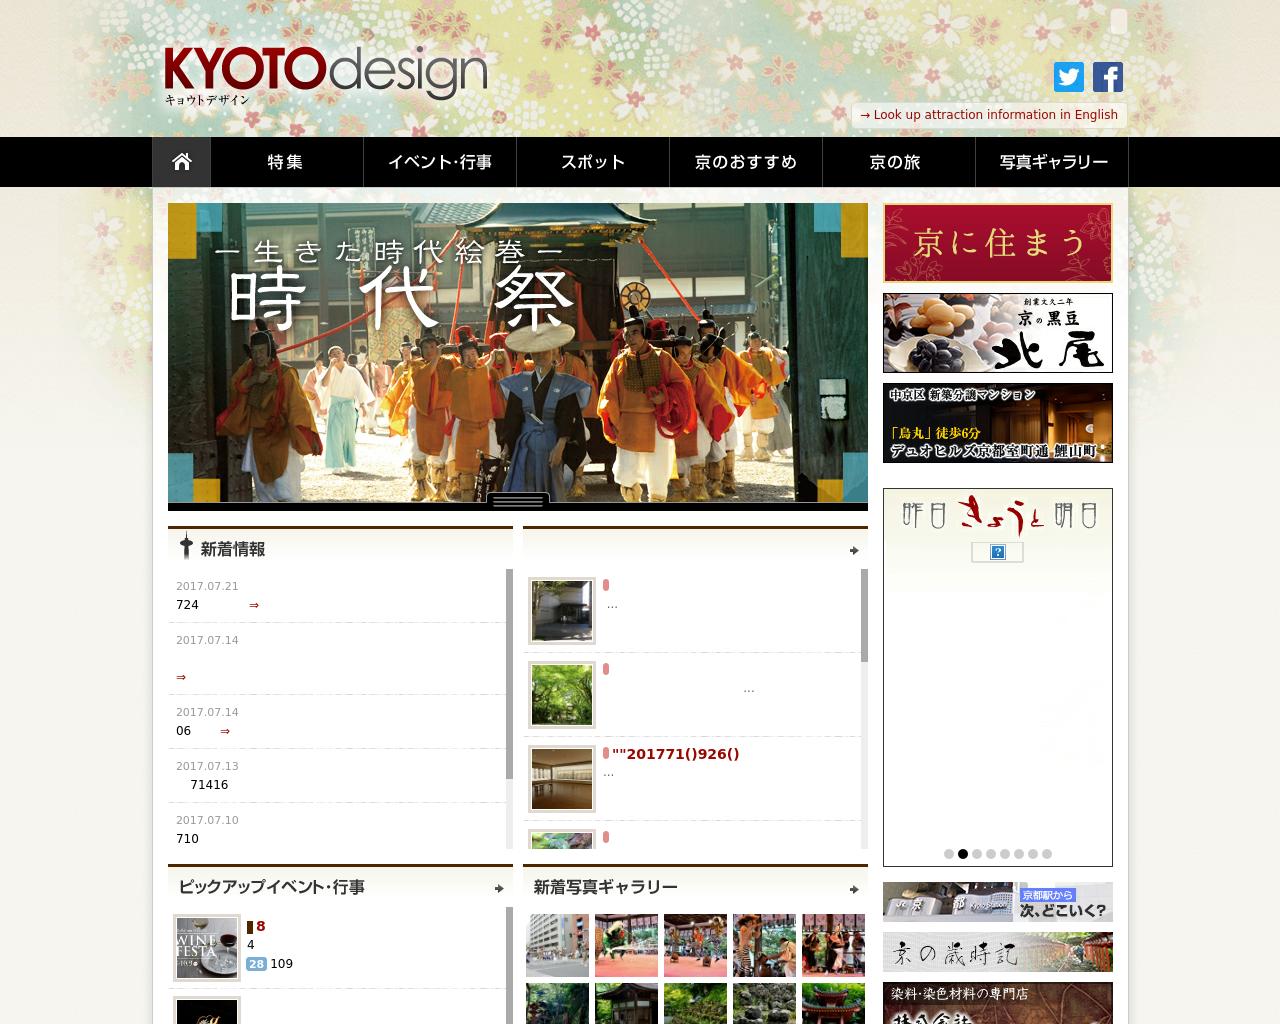 KYOTOdesign-Advertising-Reviews-Pricing